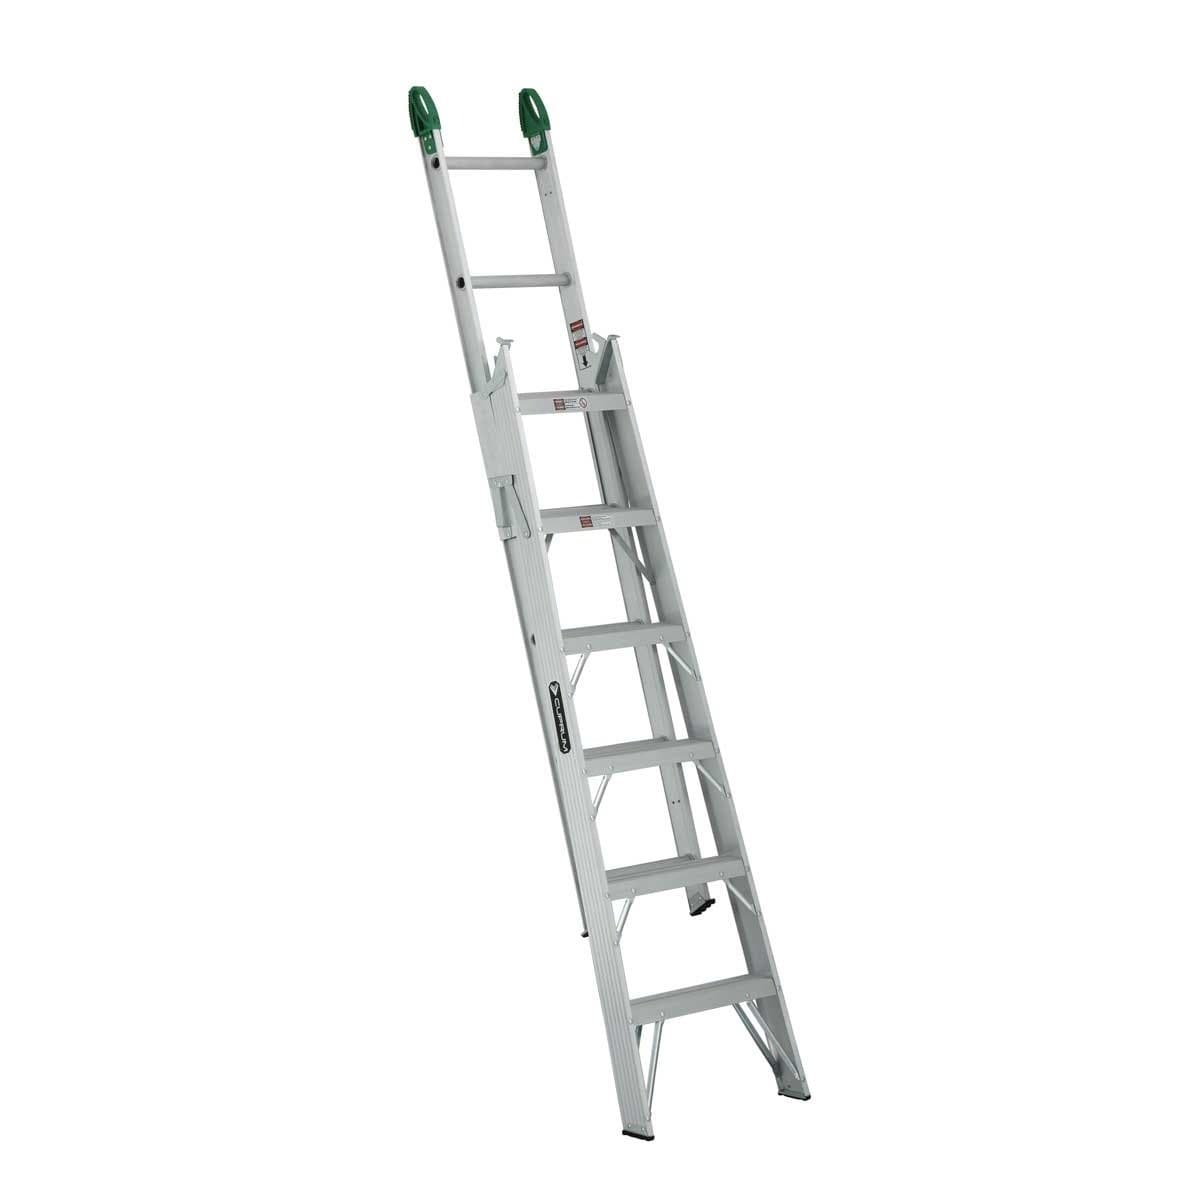 Escalera Convertible de Aluminio (13 Escalones) Cuprum C-2287-13